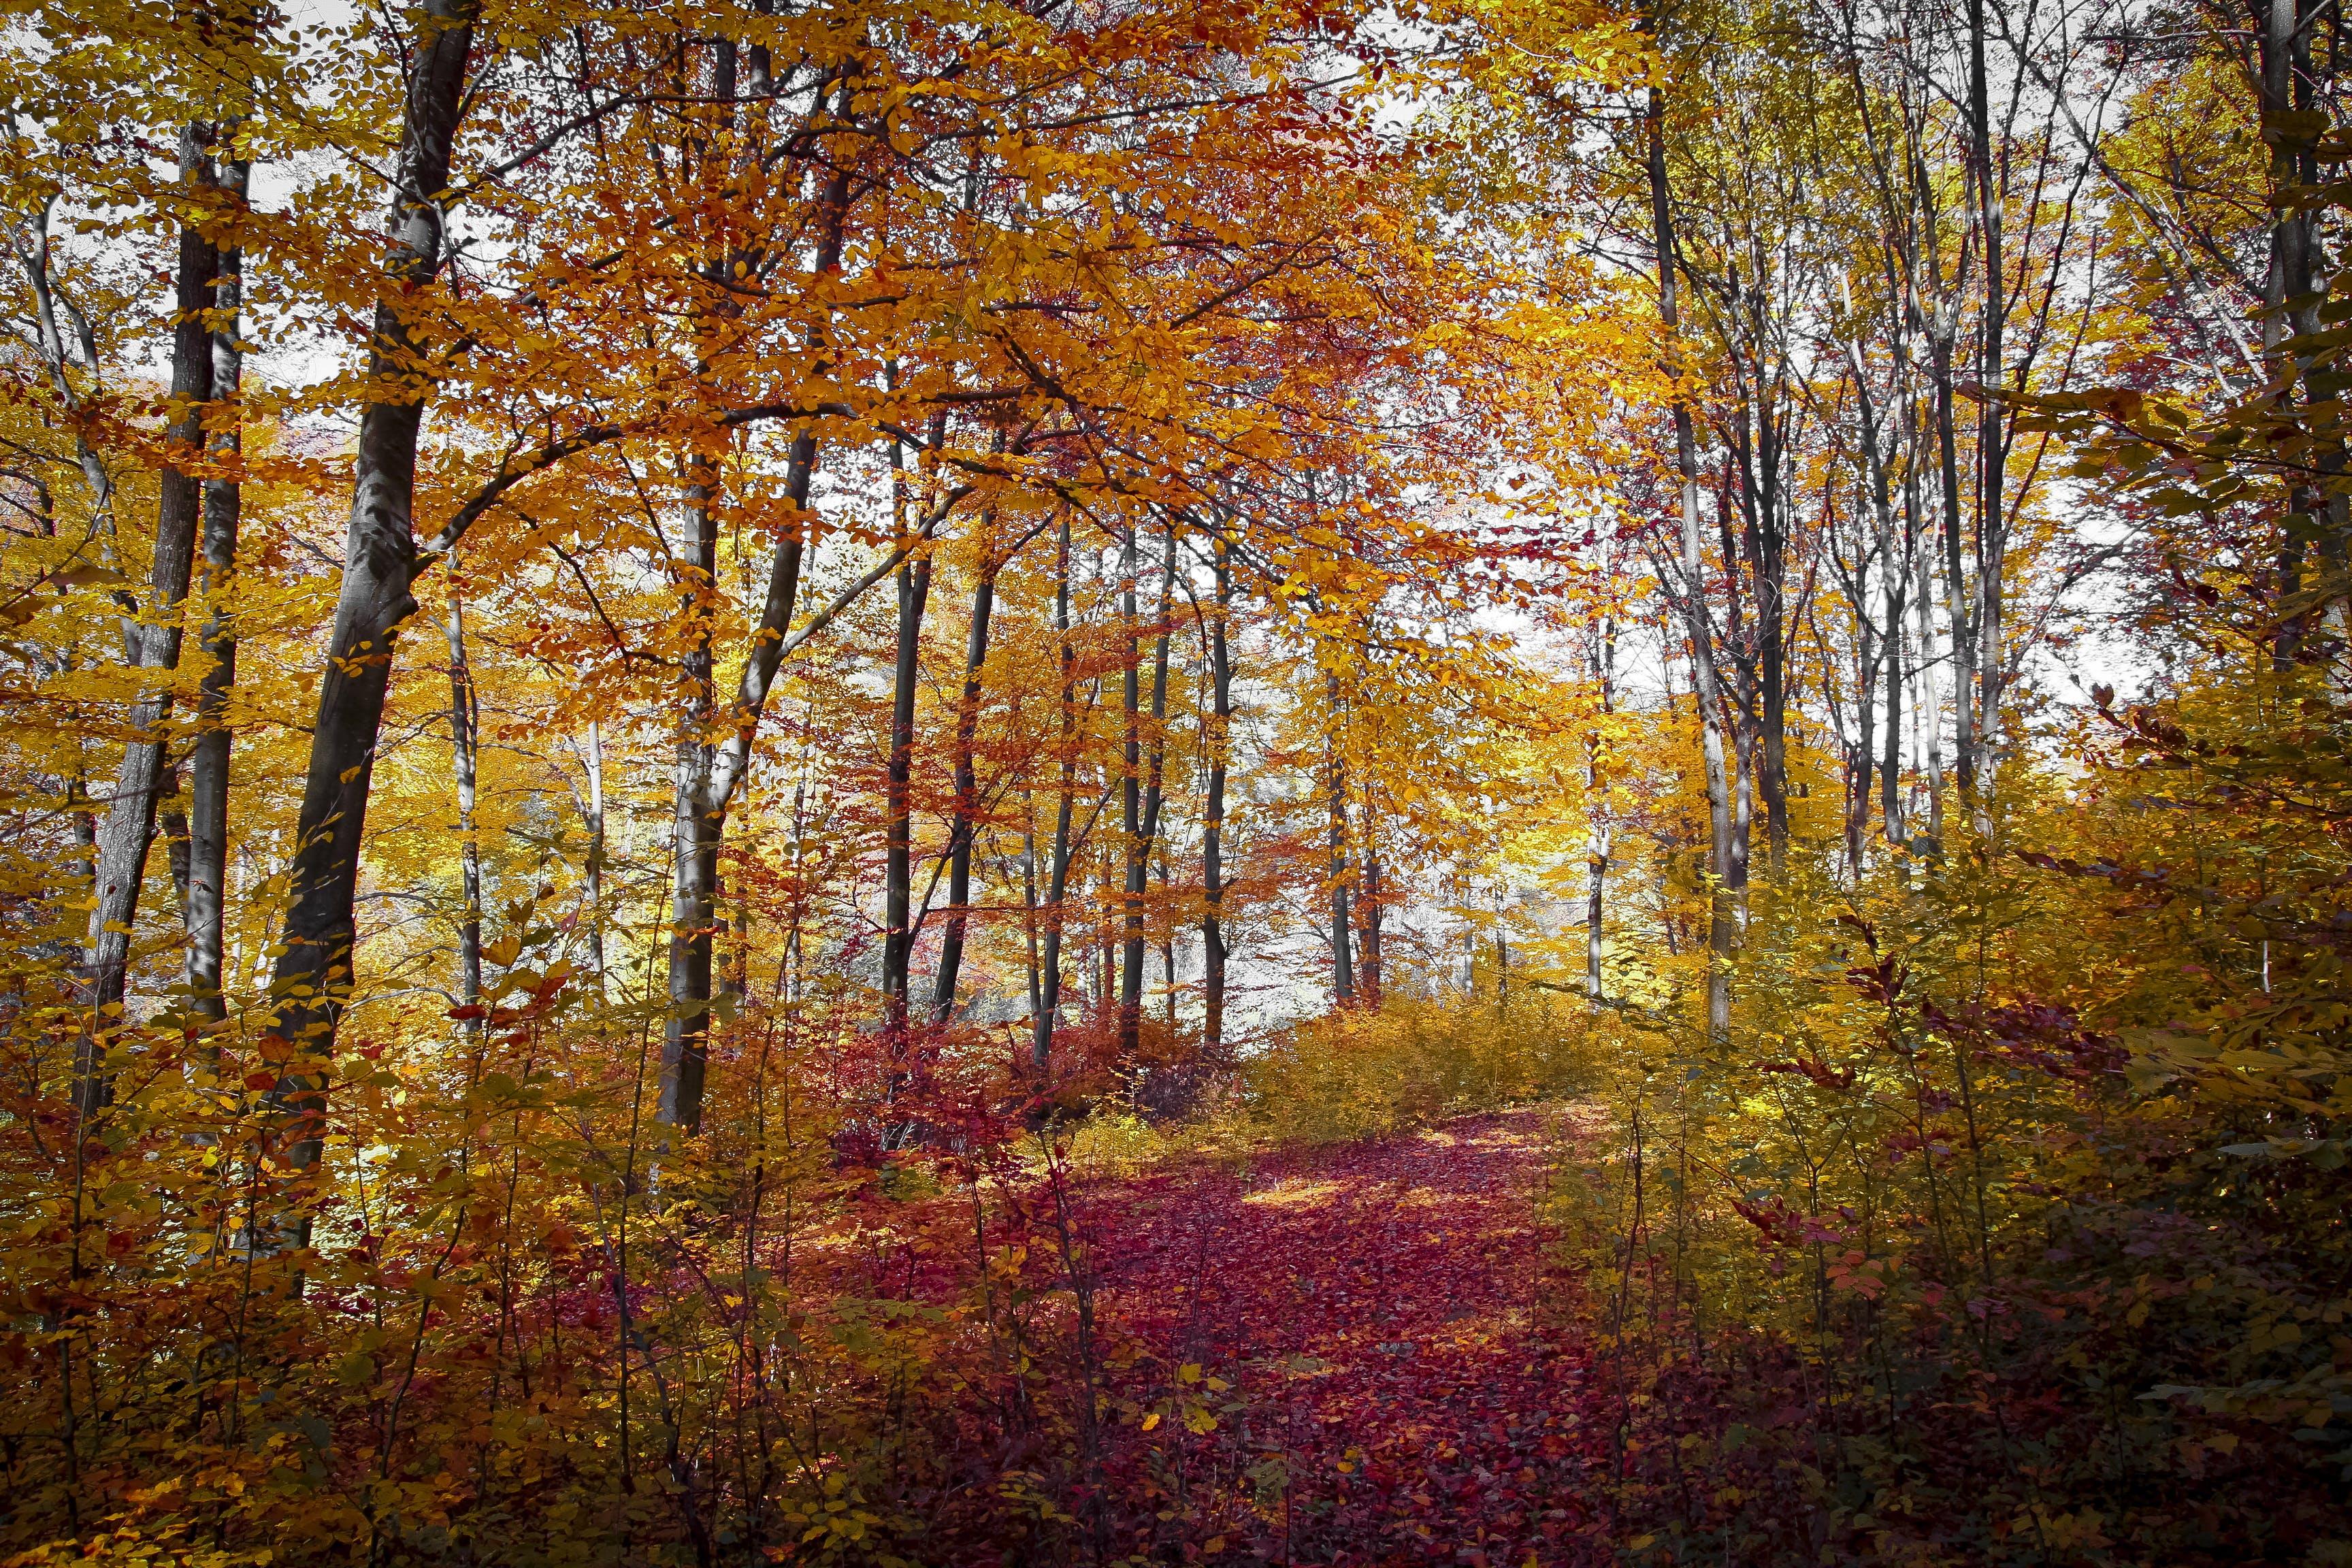 autumn, branch, daylight